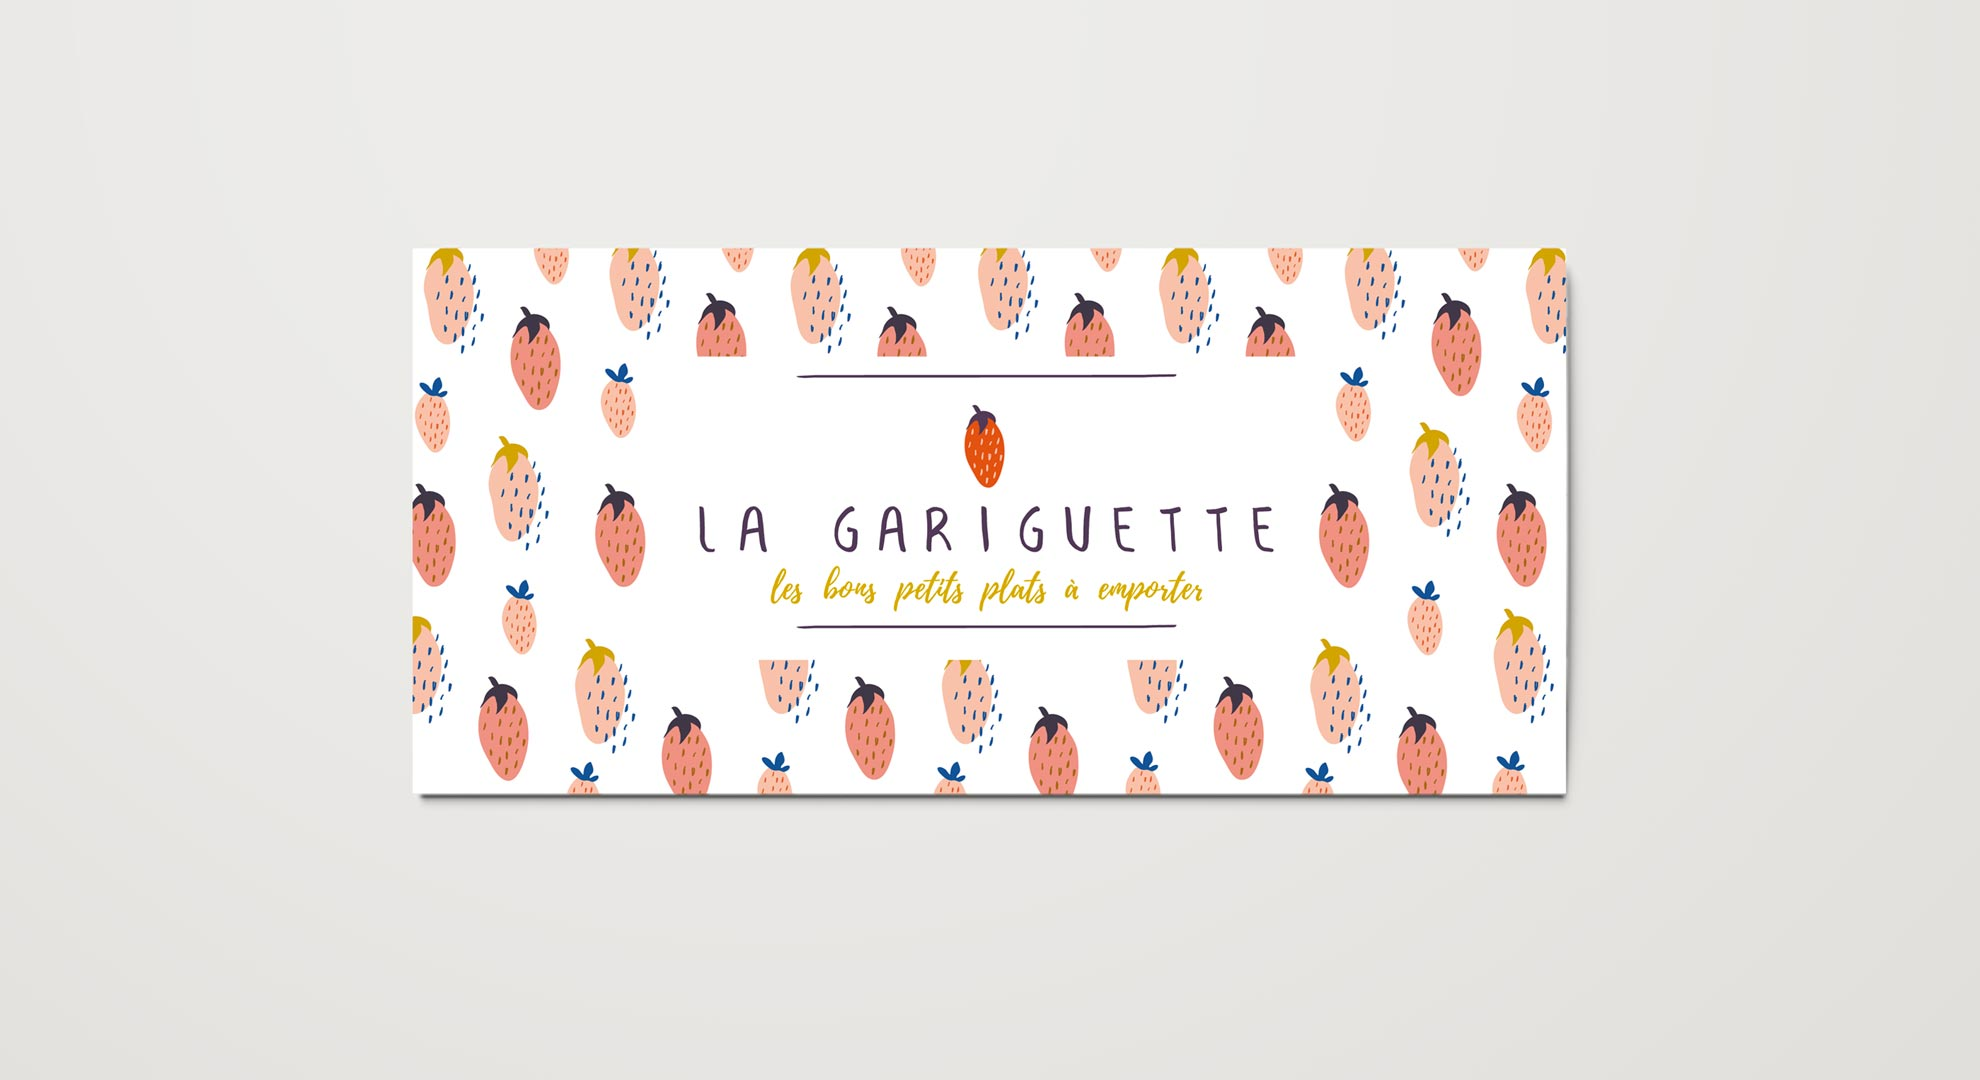 La Gariguette flyer